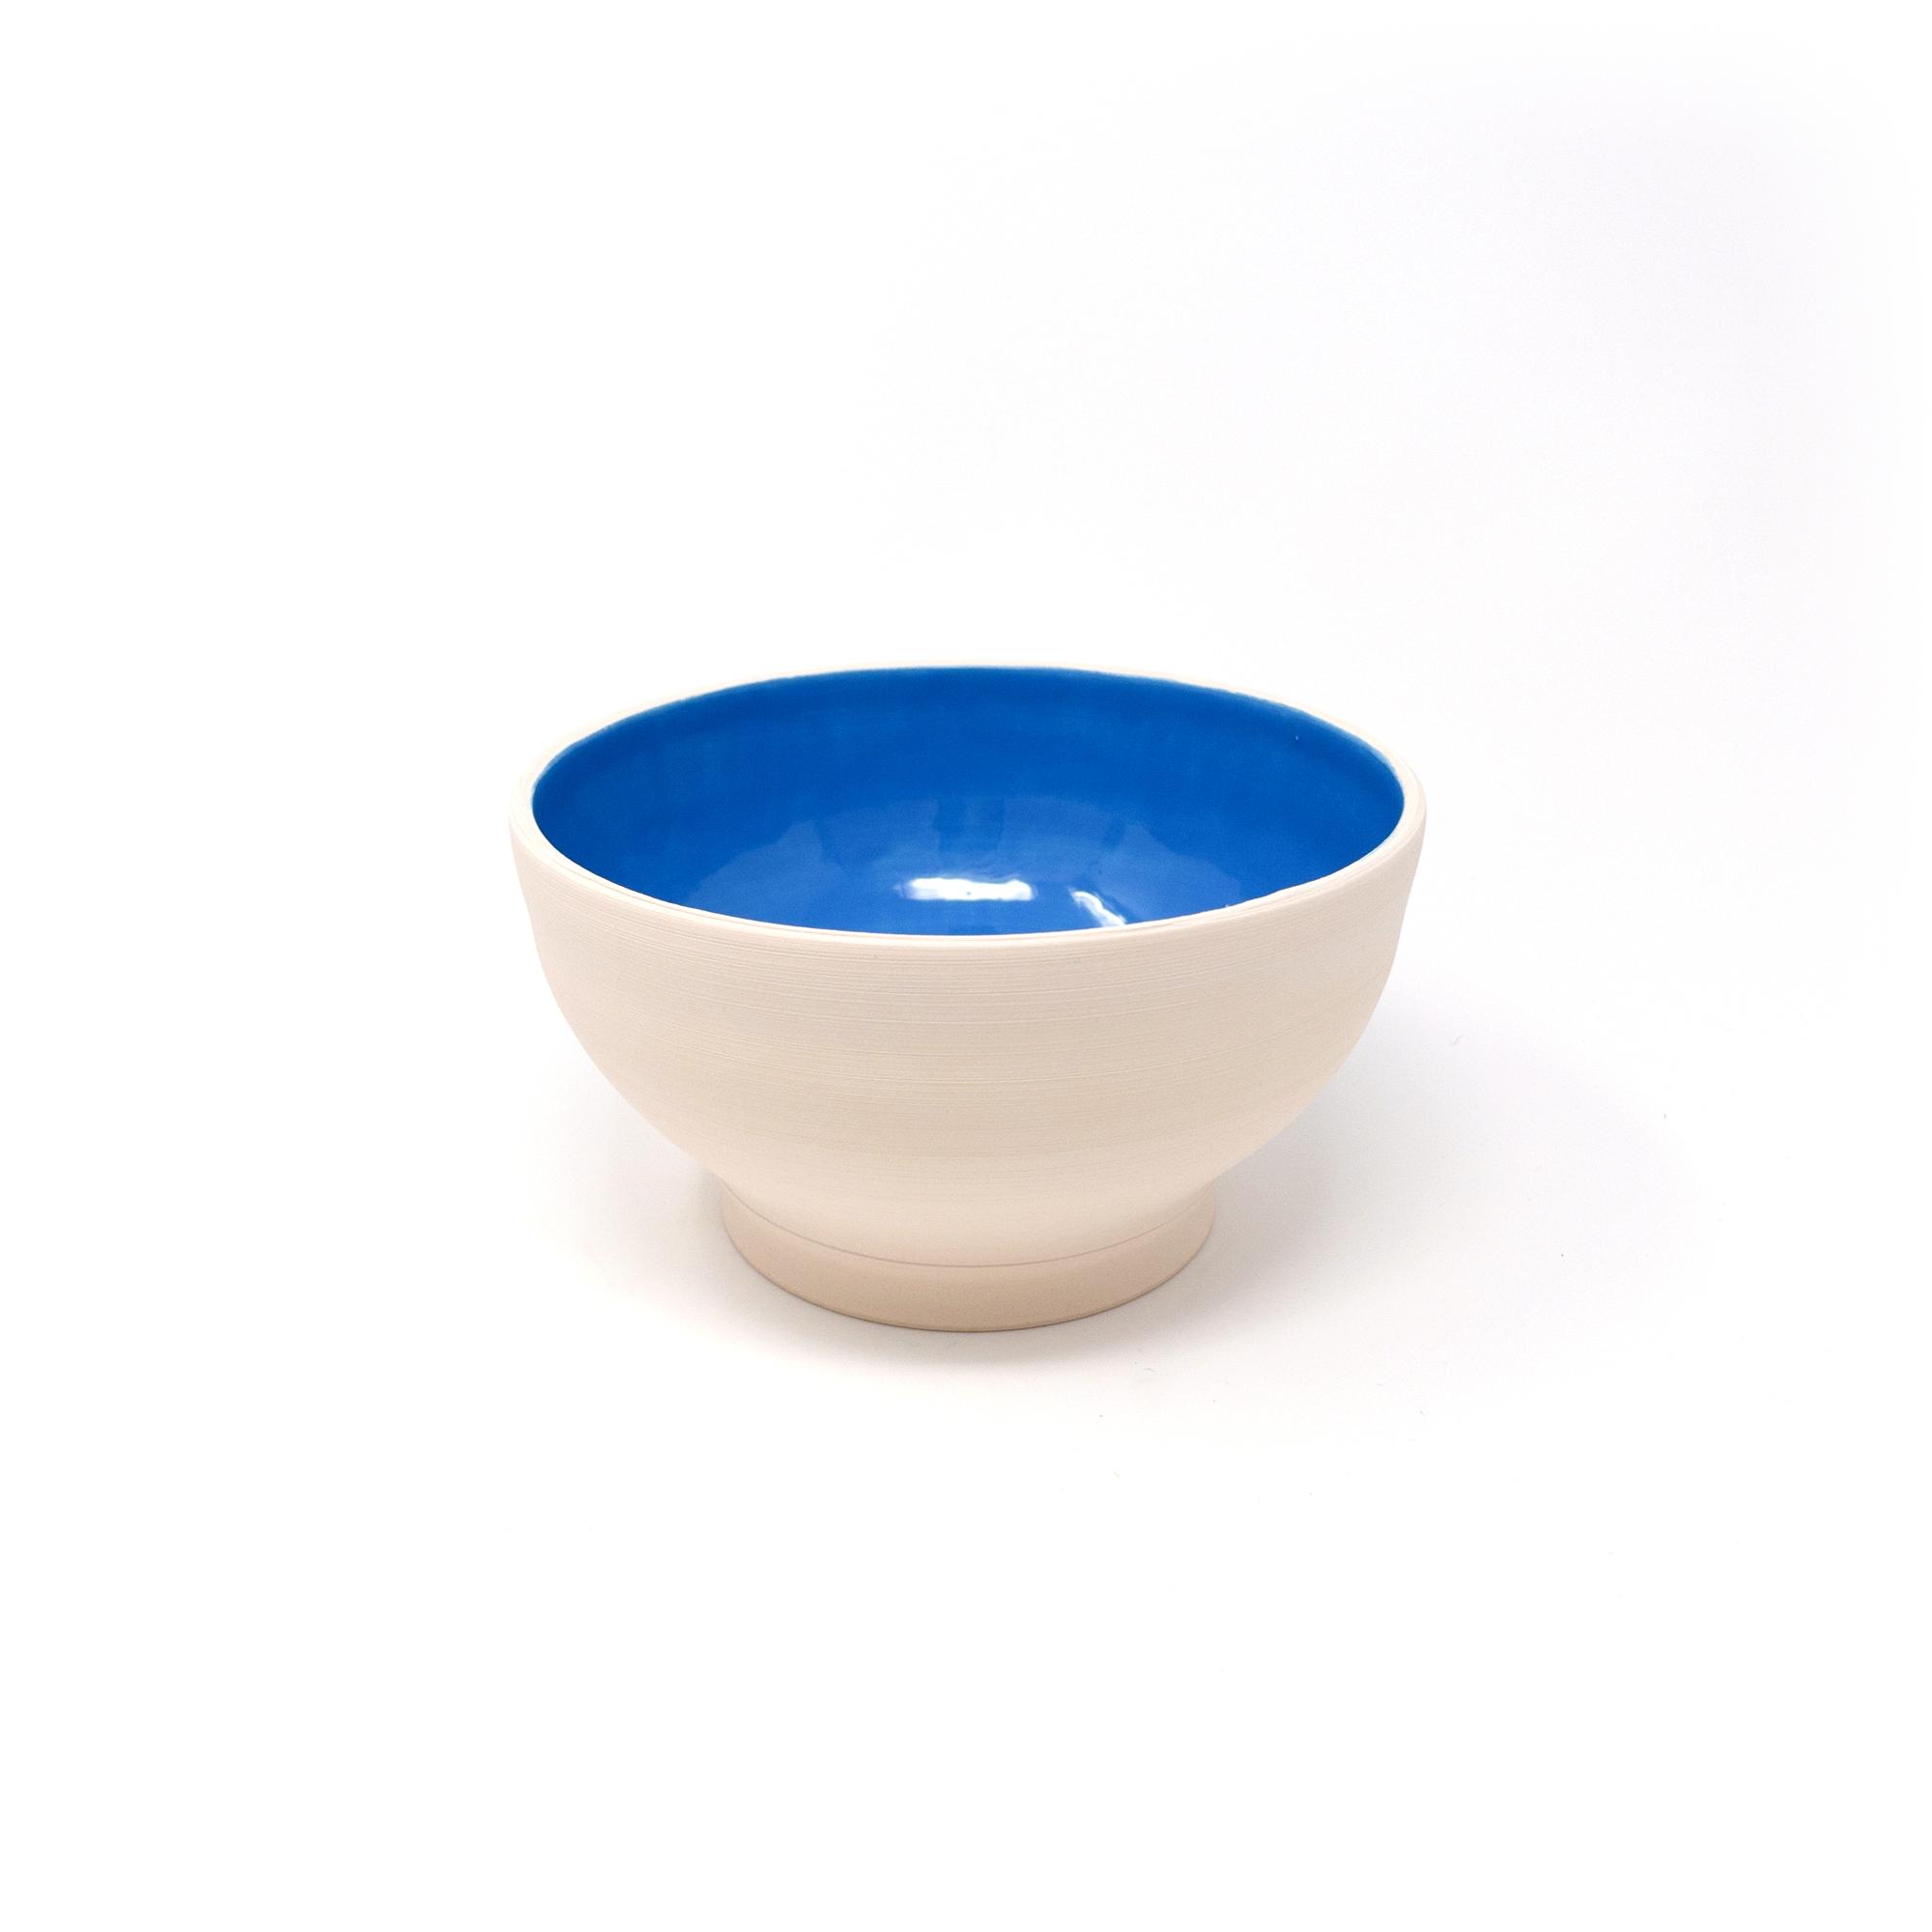 Cornflower Blue Bowl